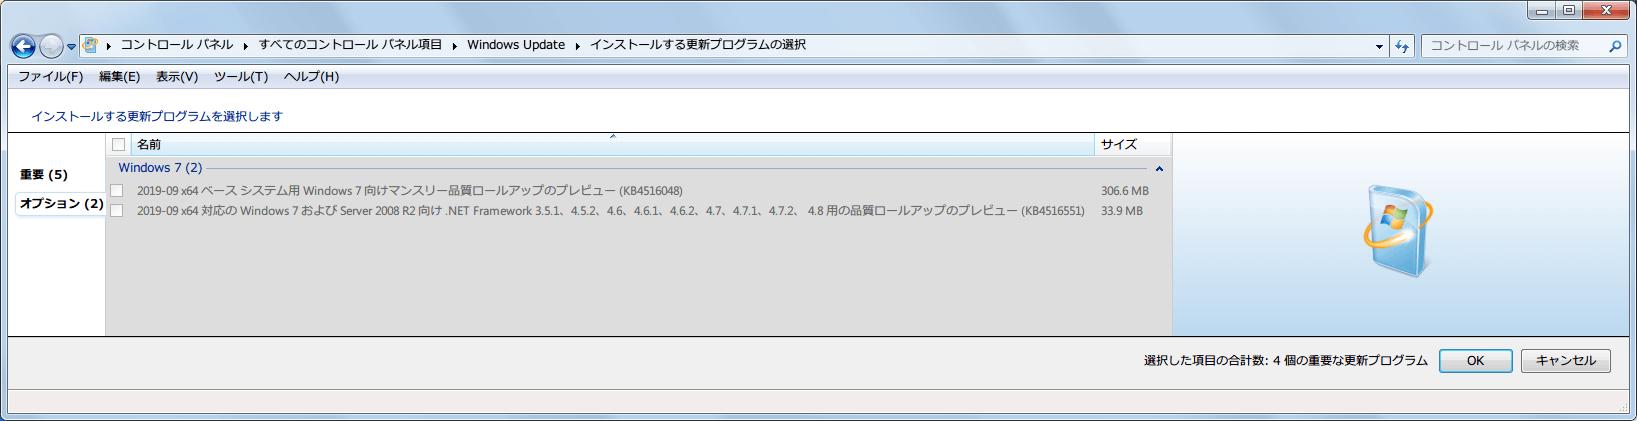 Windows 7 64bit Windows Update オプション 2019年9月分リスト KB4516048、KB4516551 非表示